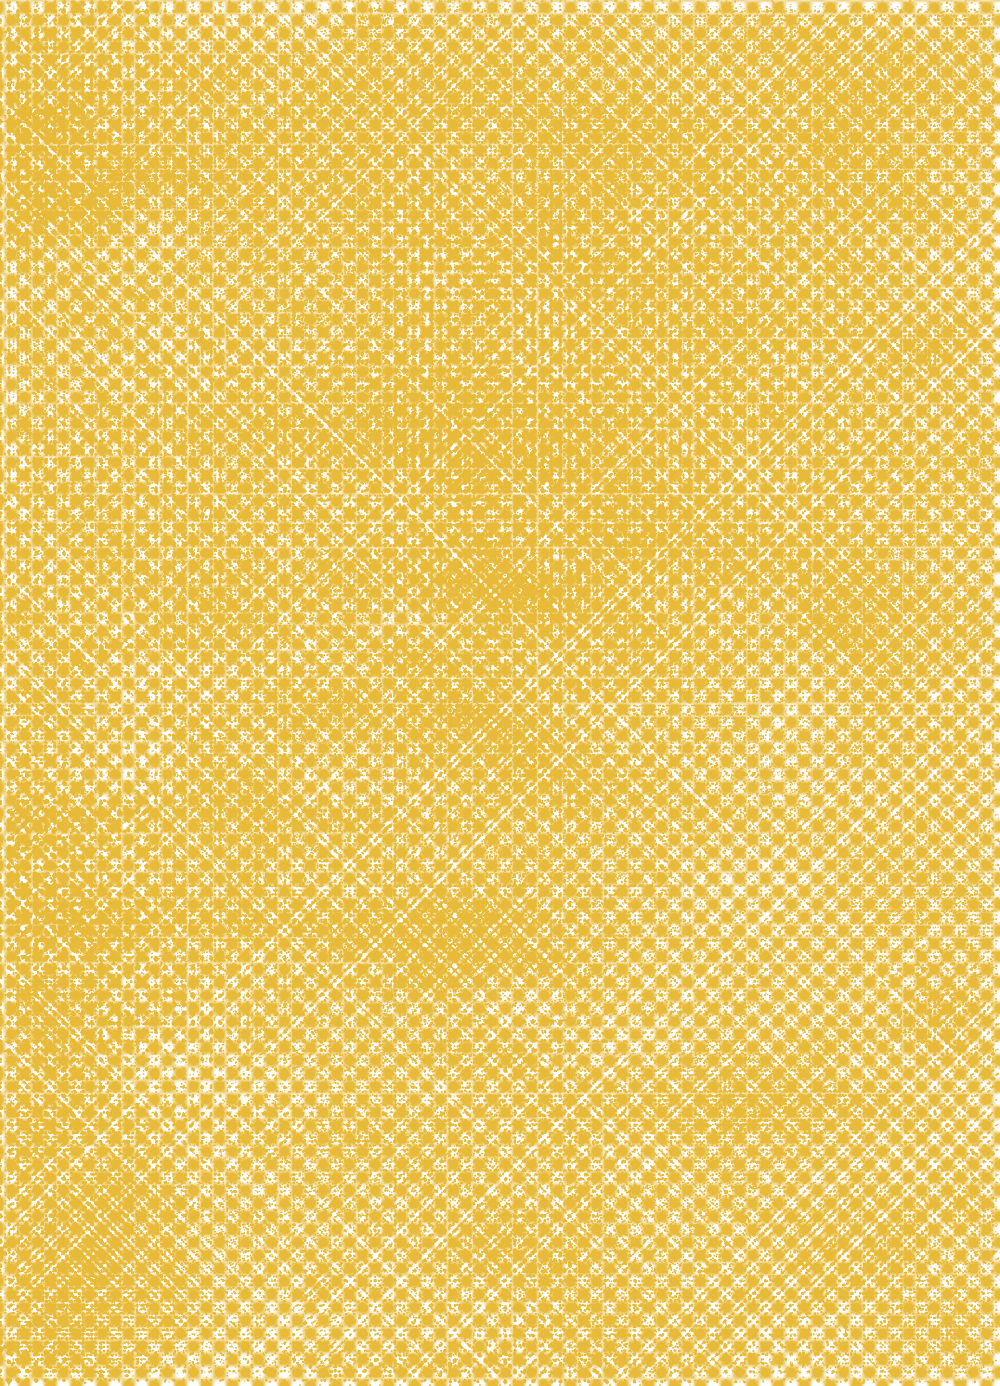 mandalu_pattern_halftone_01-sm.jpg